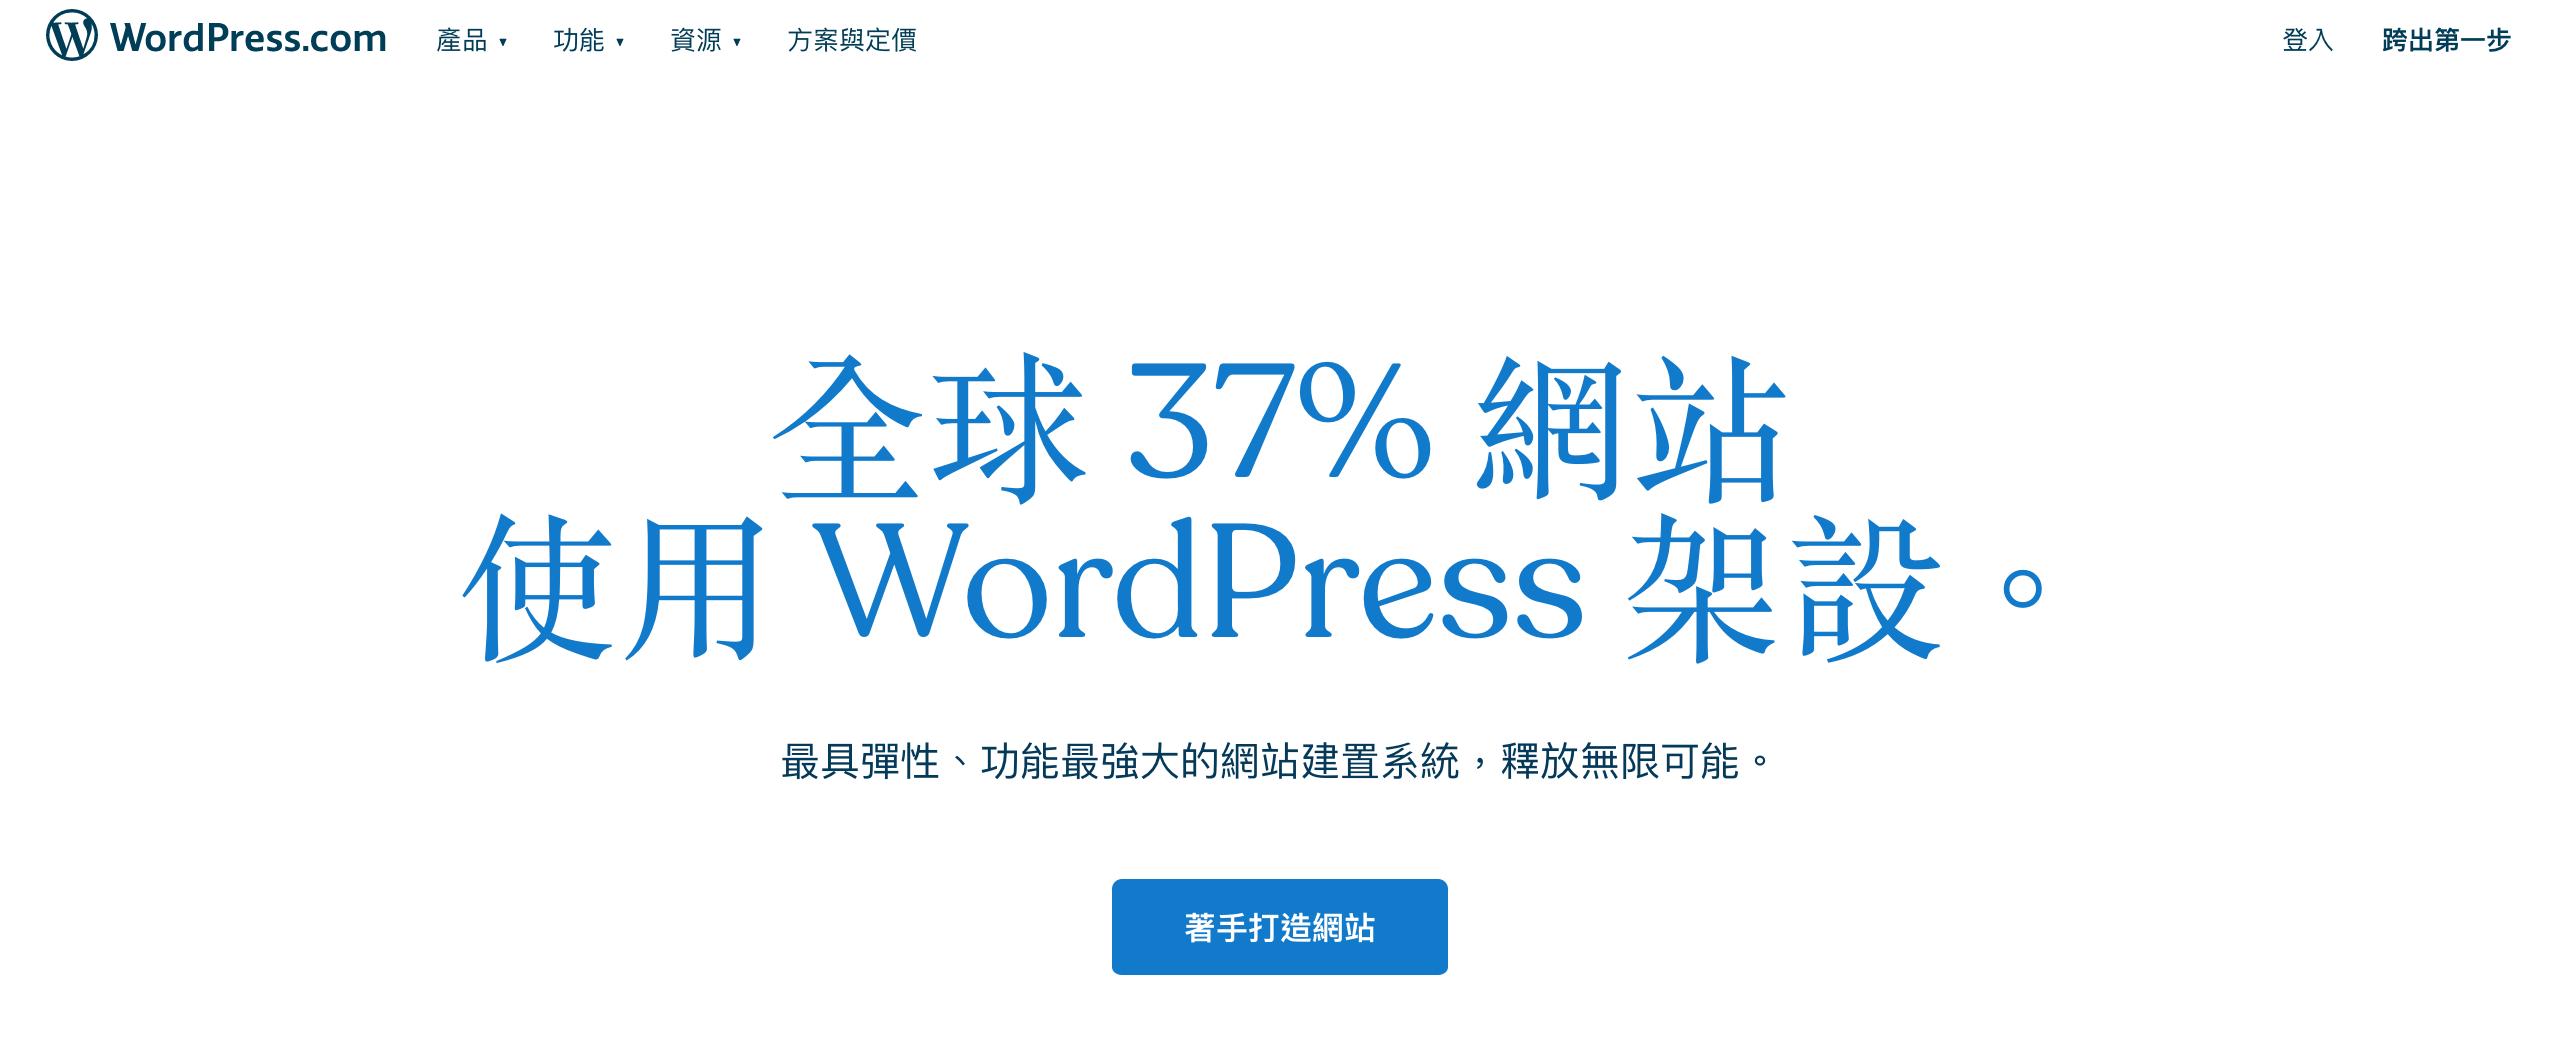 WordPress 網站使用人數